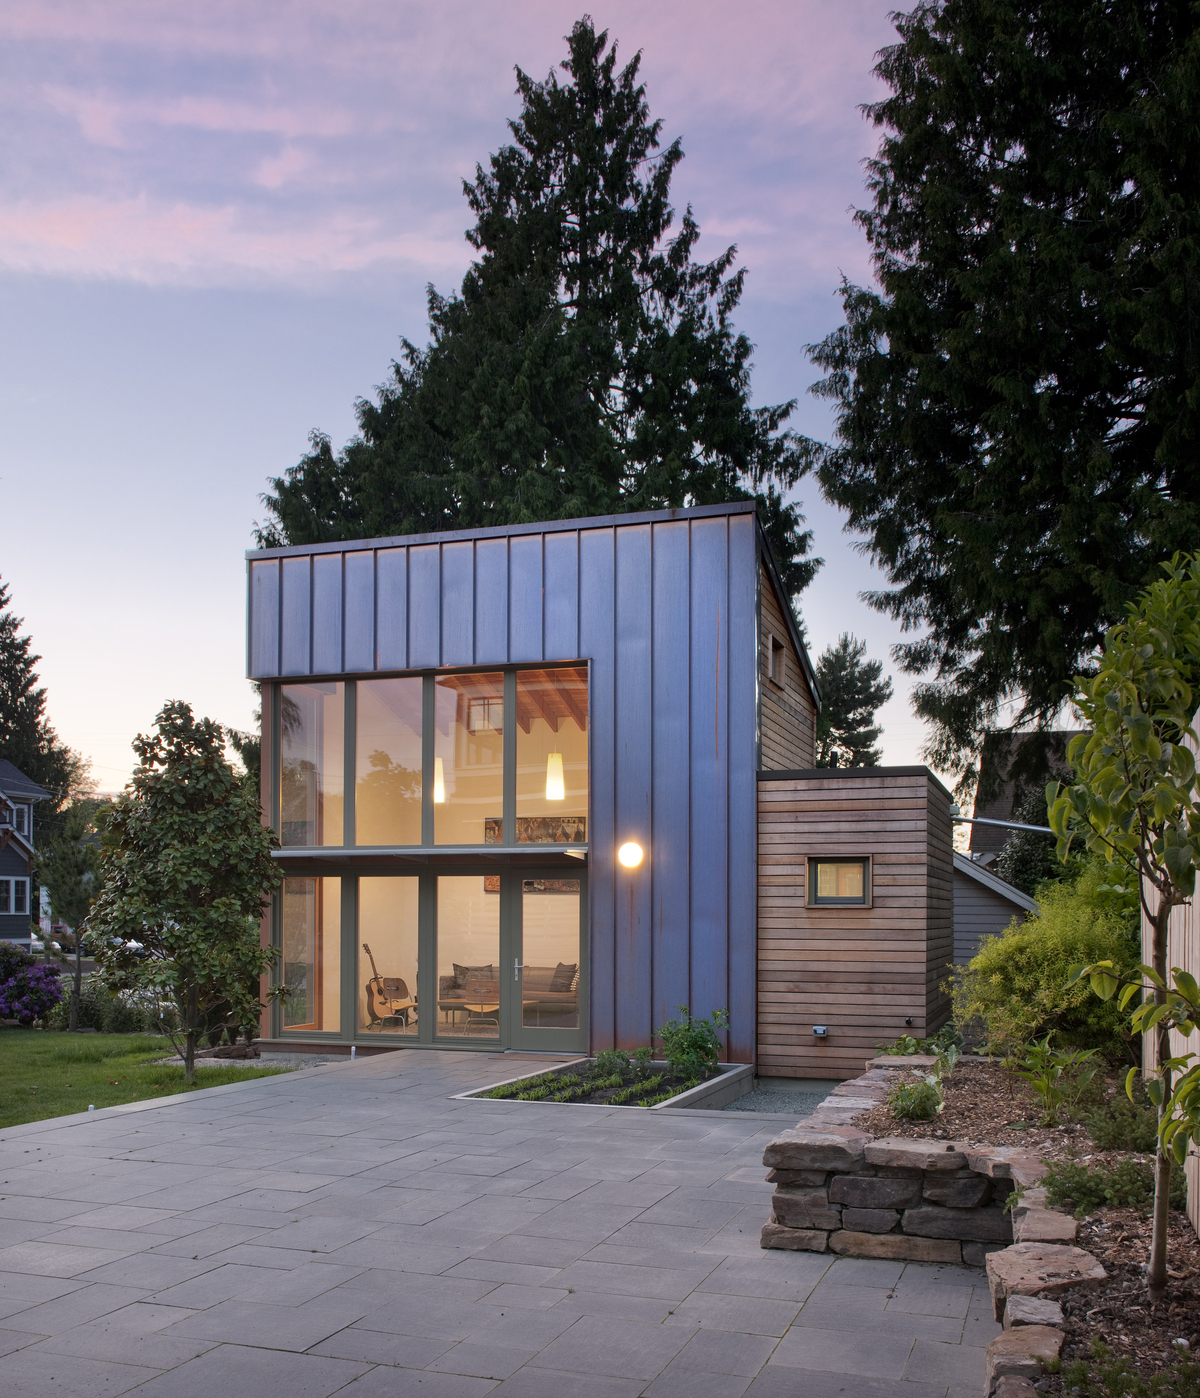 exterior patio and garden pavilion